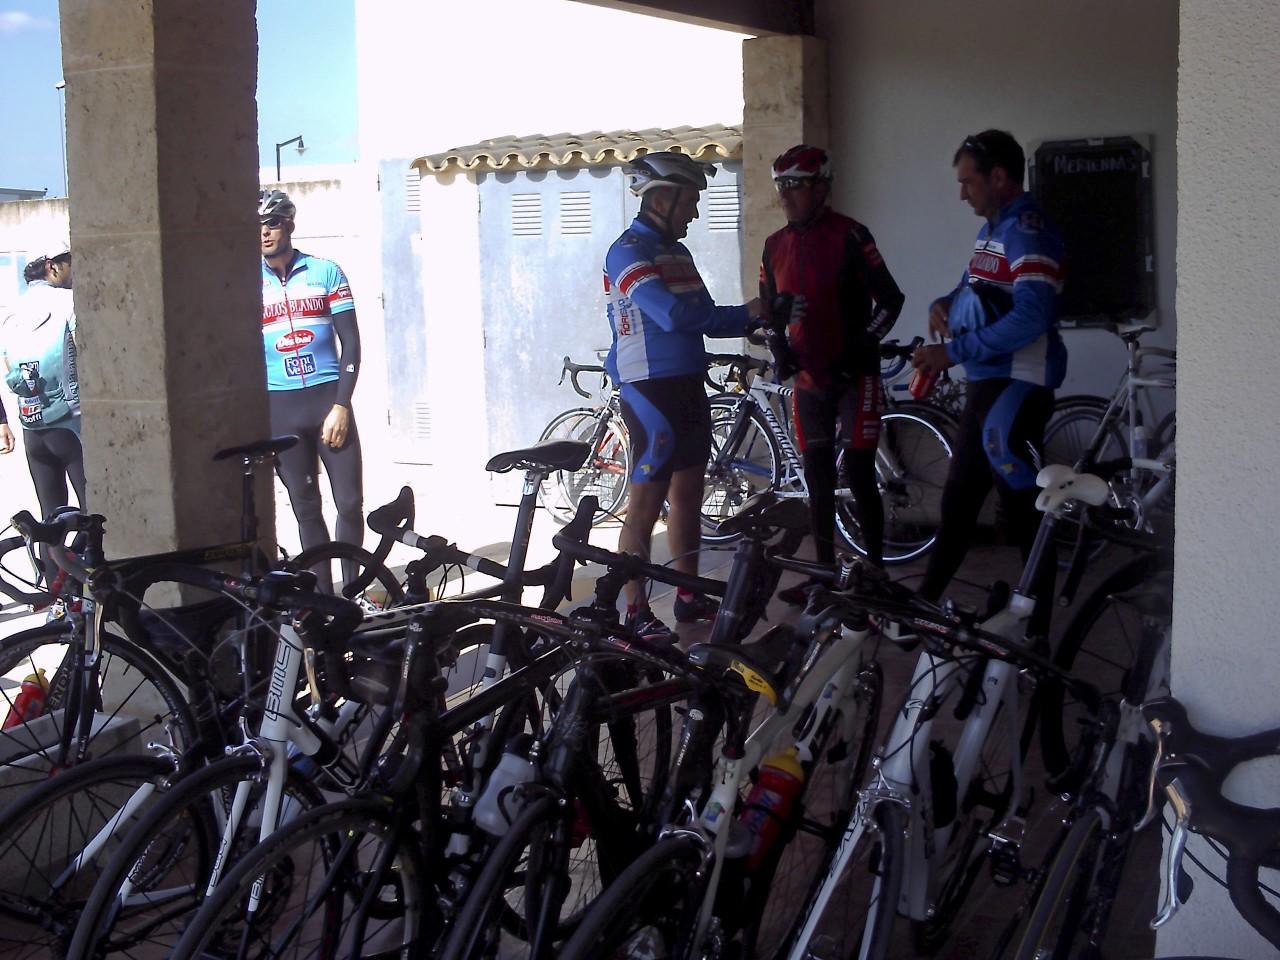 21-03-2009-palankas-team-competicion036-50